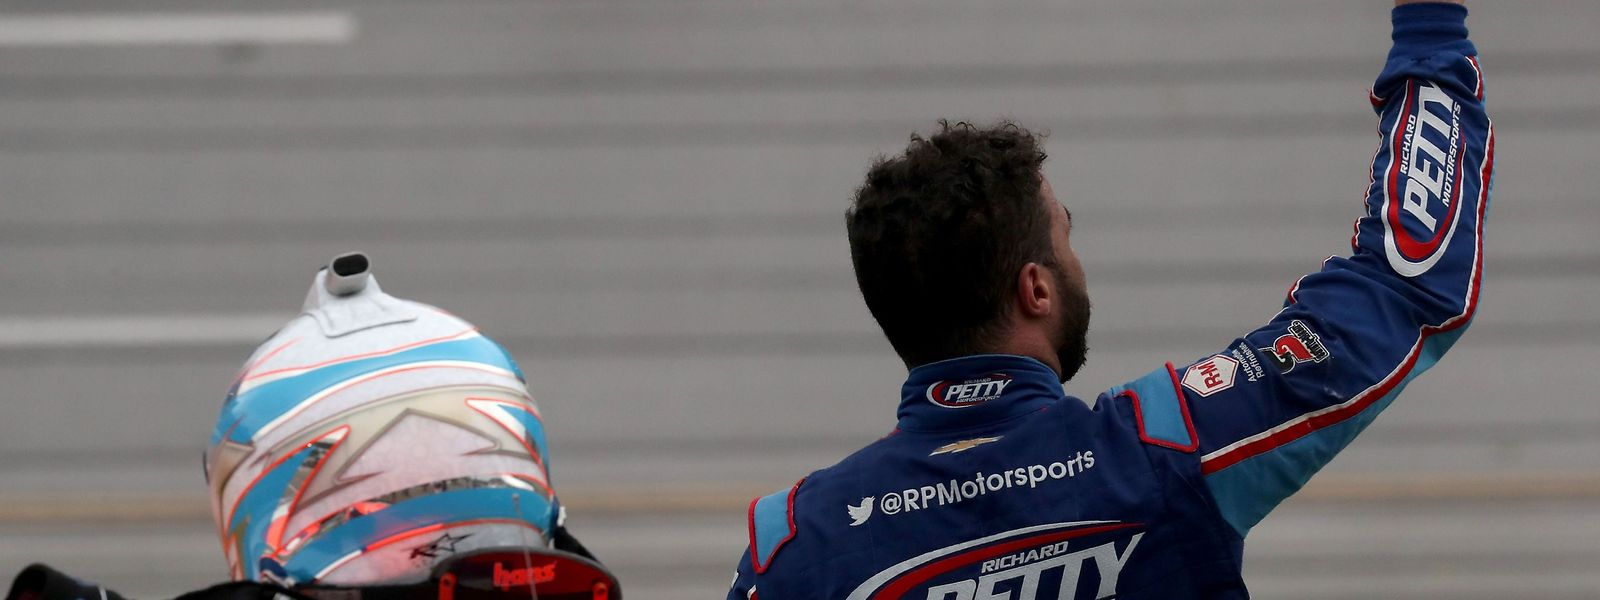 Nascar-Fahrer Bubba Wallace winkt nach dem NASCAR Cup Series GEICO 500 in Talladega Superspeedway Fans zu.